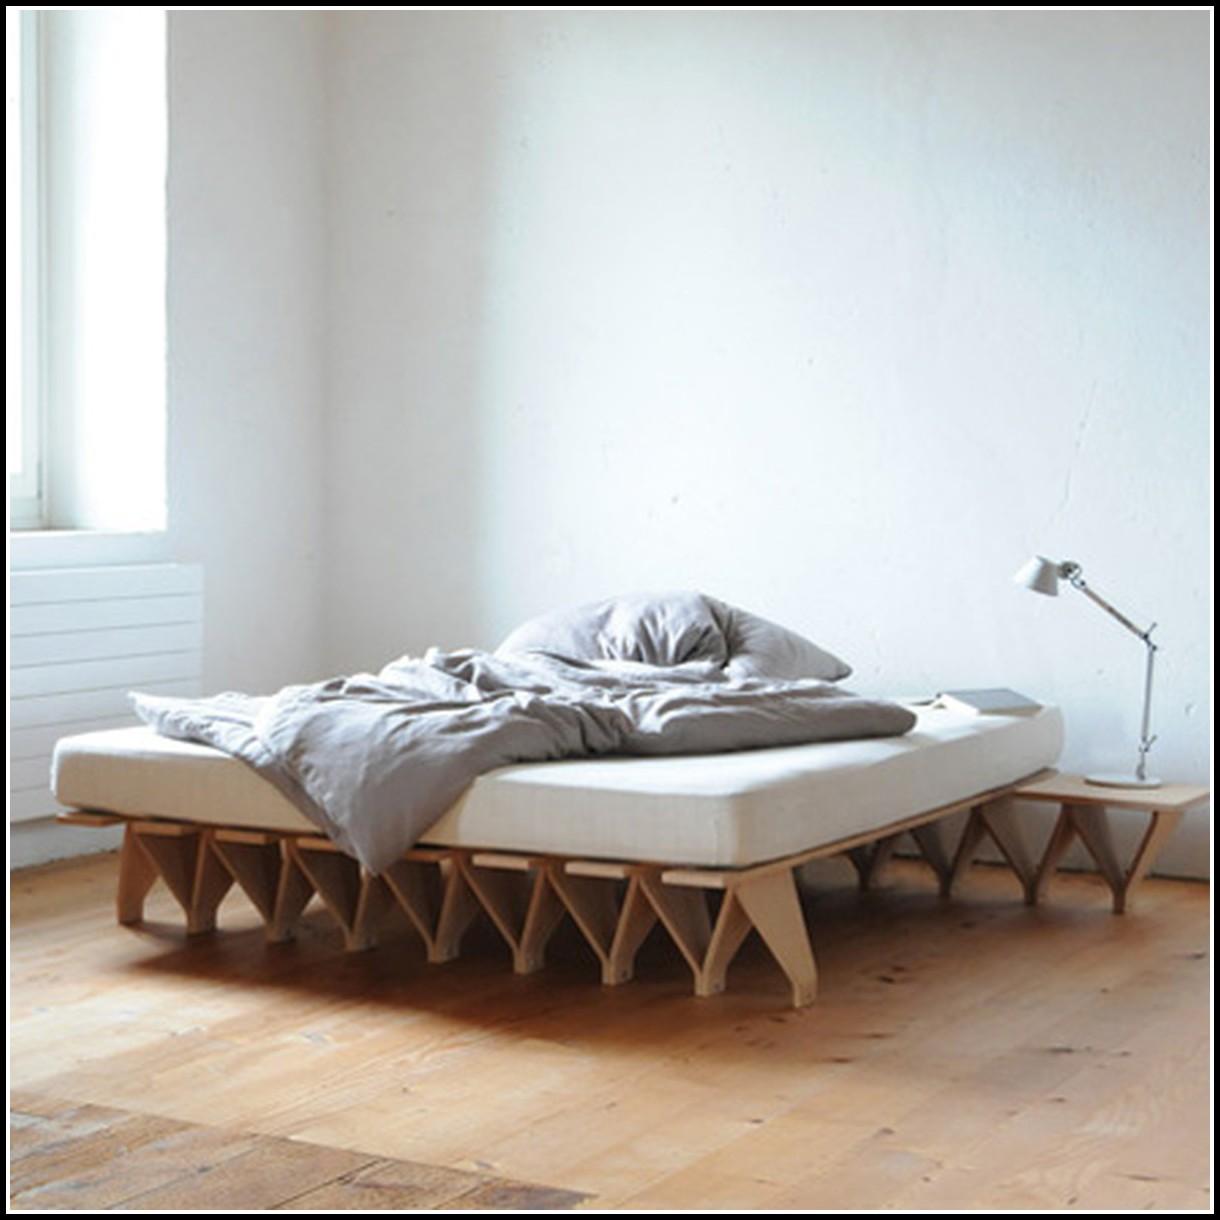 tojo v bett betten house und dekor galerie 5nwl3dqkao. Black Bedroom Furniture Sets. Home Design Ideas